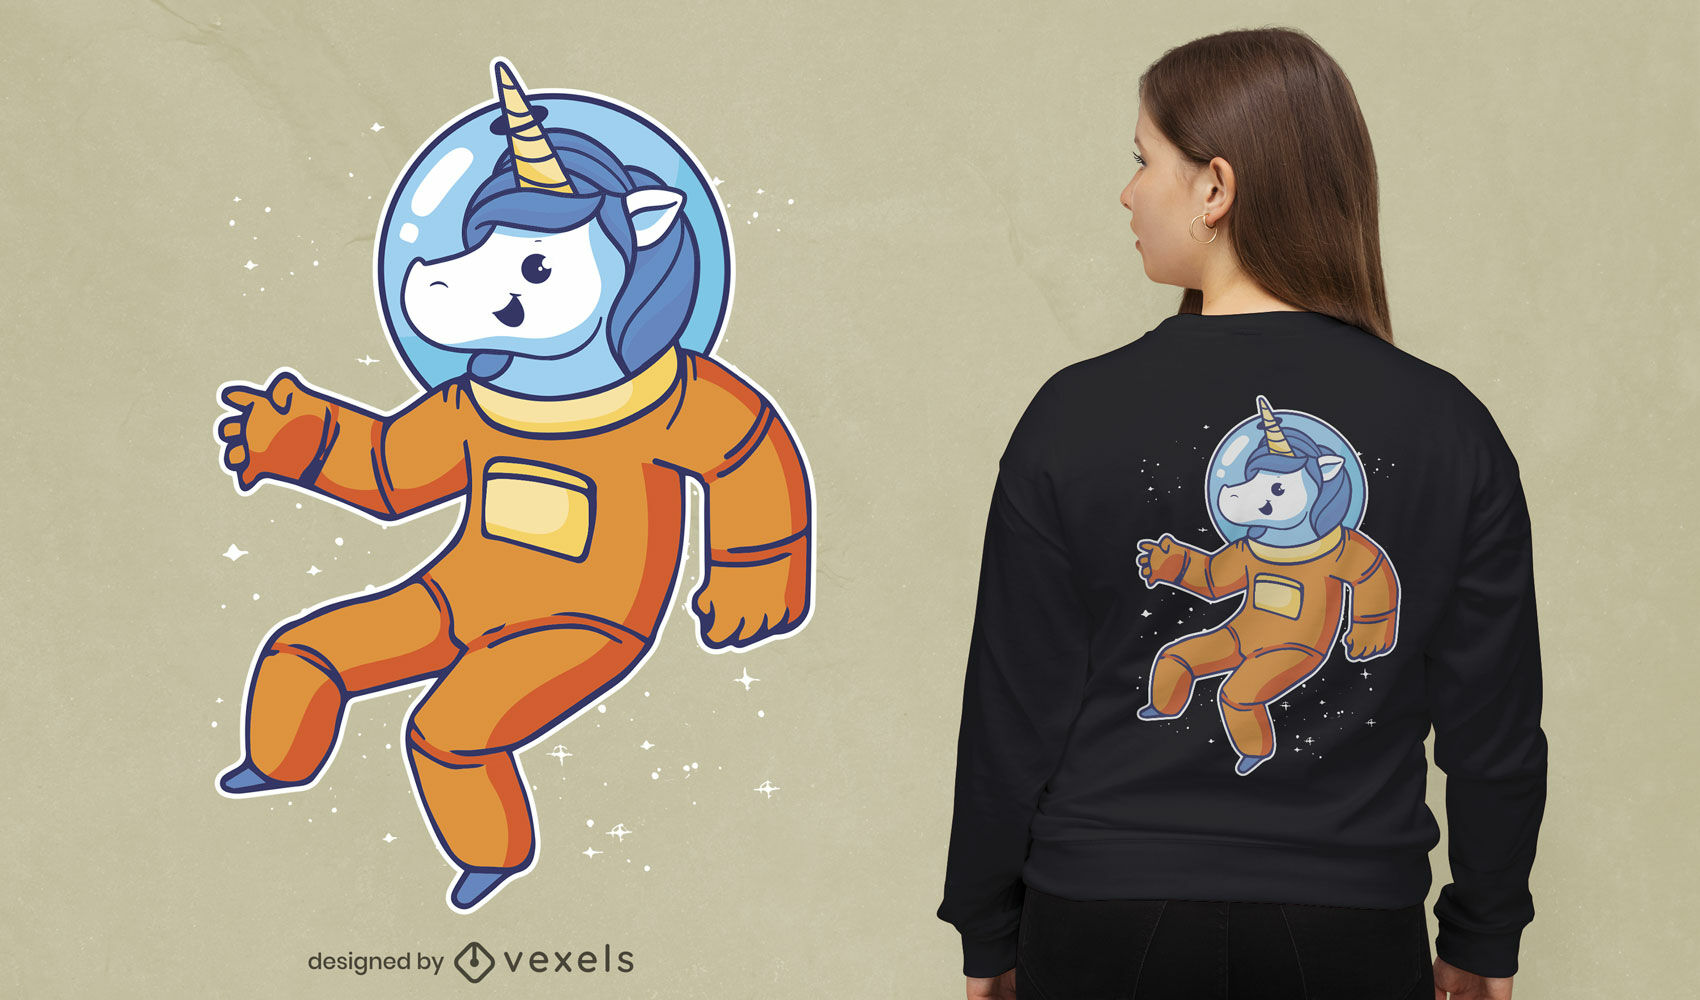 Astronaut unicorn t-shirt cartoon design